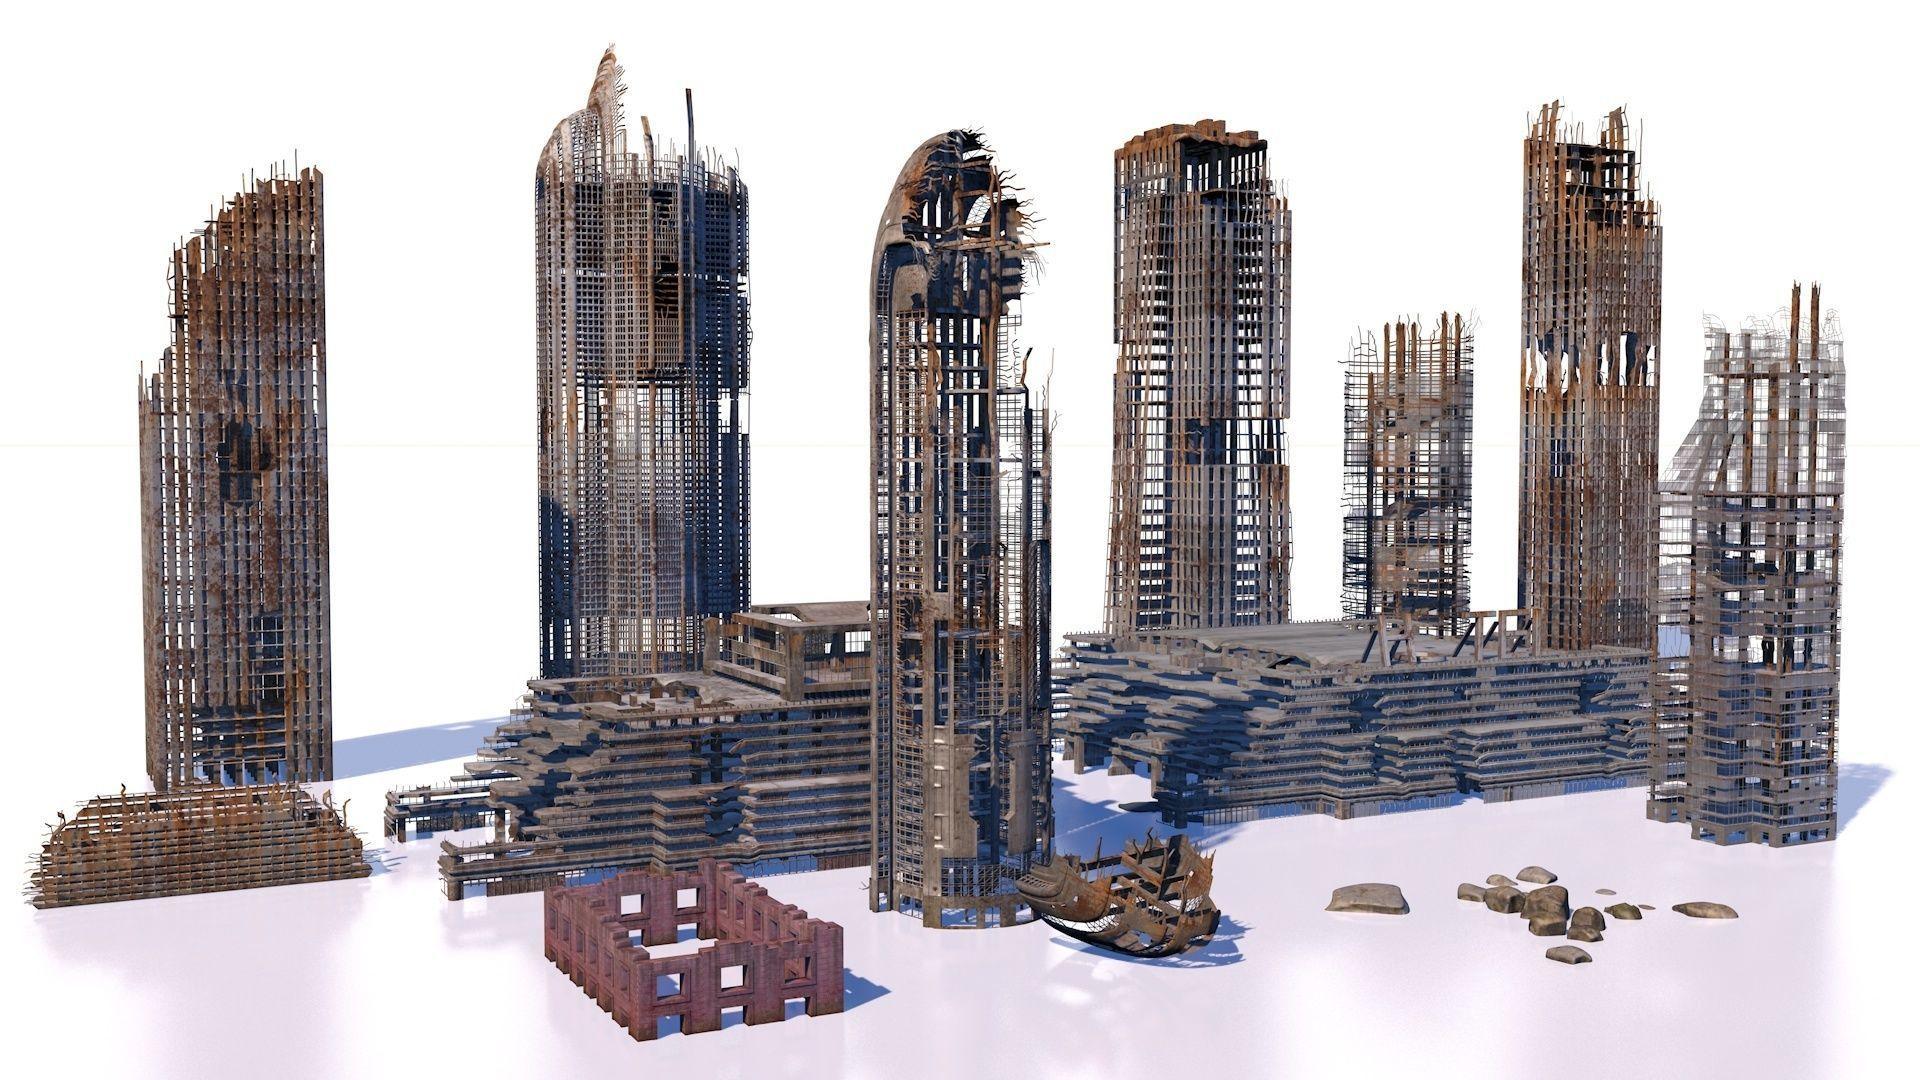 Buildings and skyscrapers in ruins